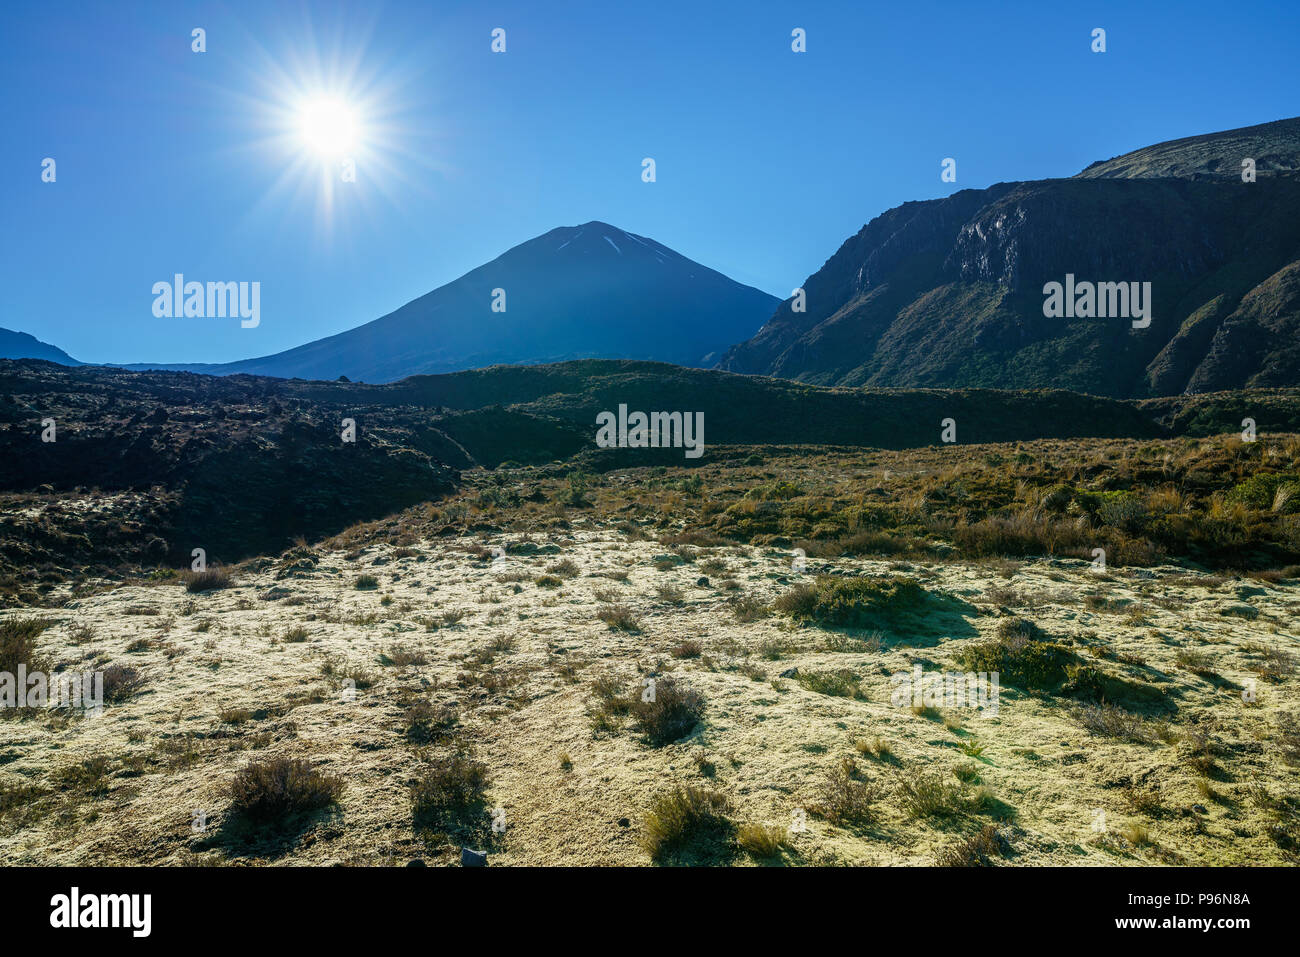 hiking the tongariro alpine crossing,sunstar over cone volcano mount ngauruhoe,new zealand - Stock Image